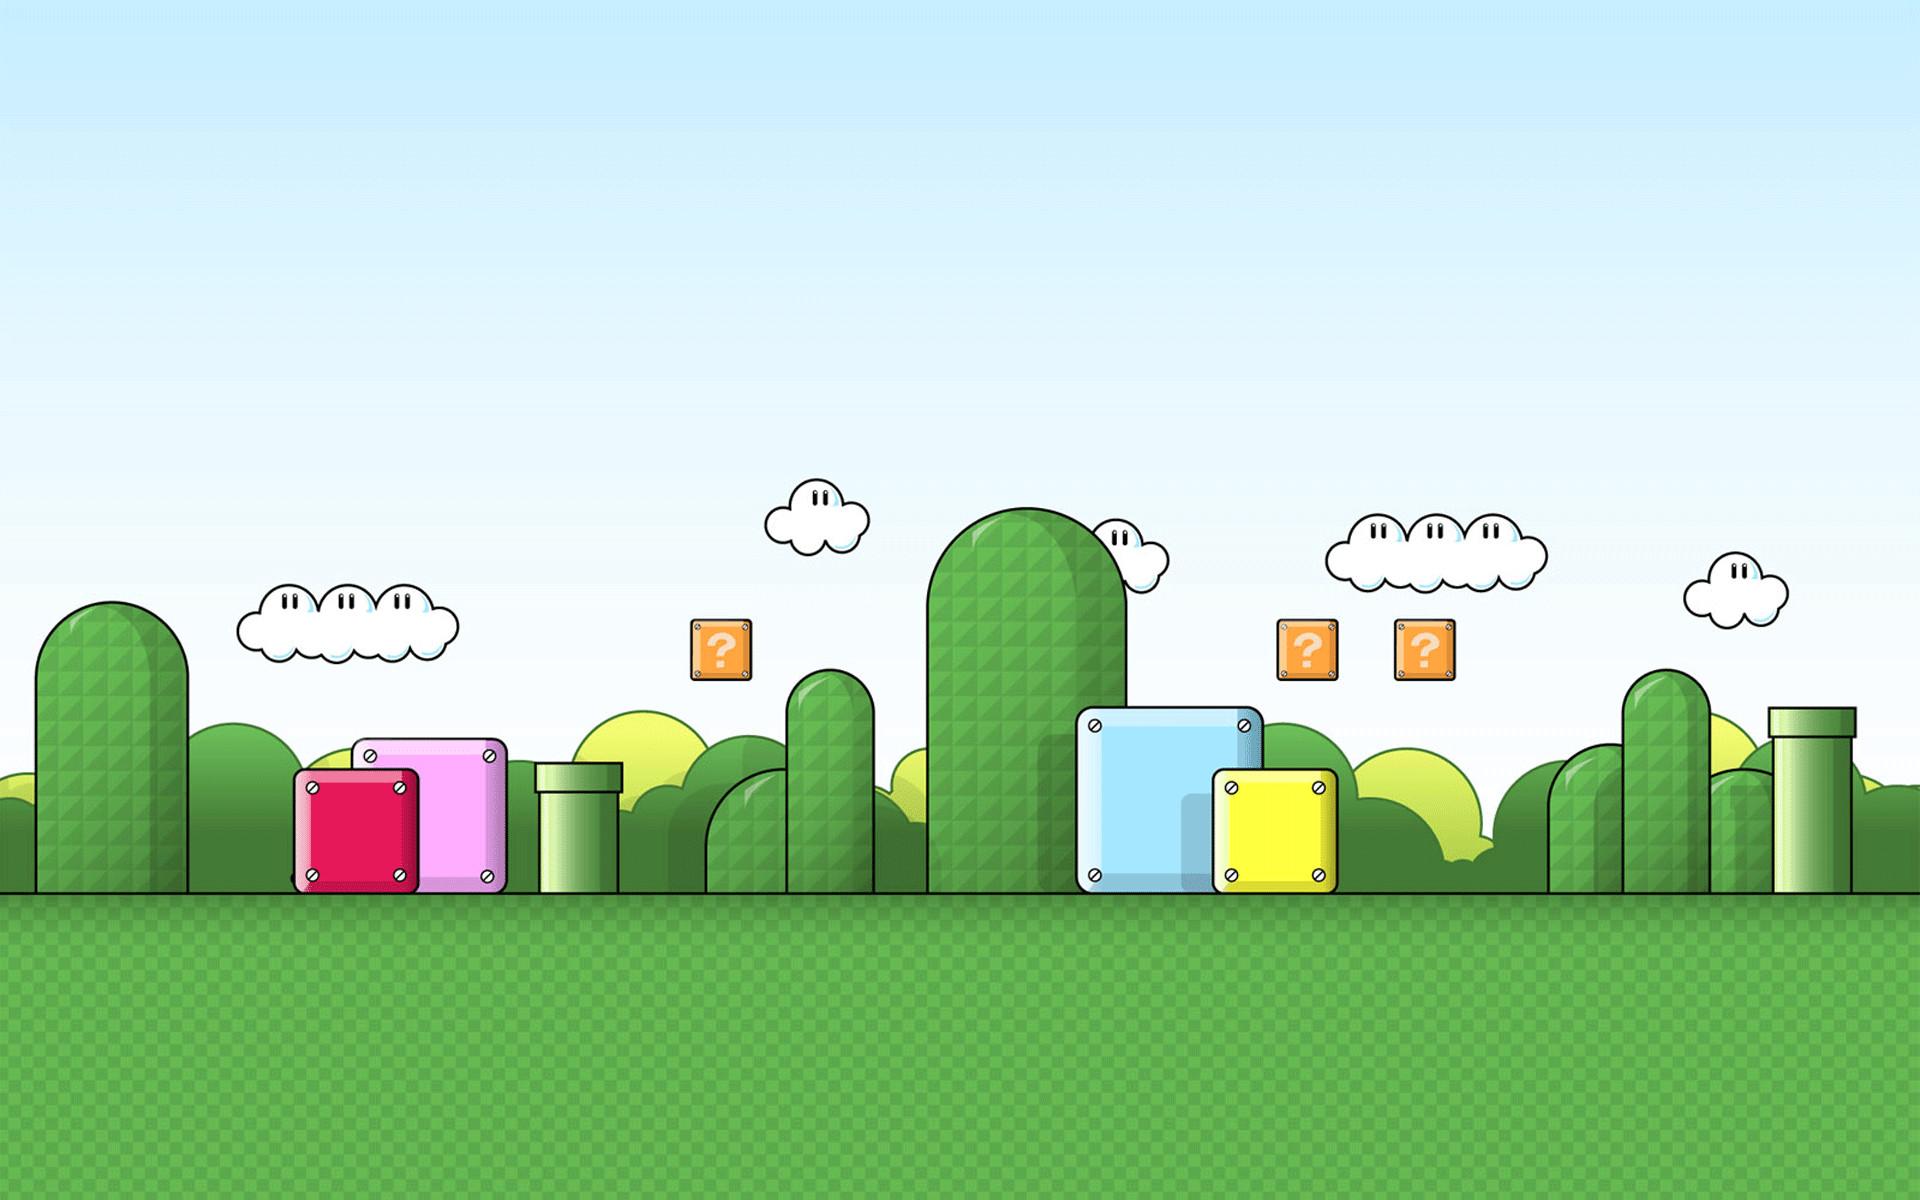 Super Mario World Wallpapers | HD Wallpapers Base